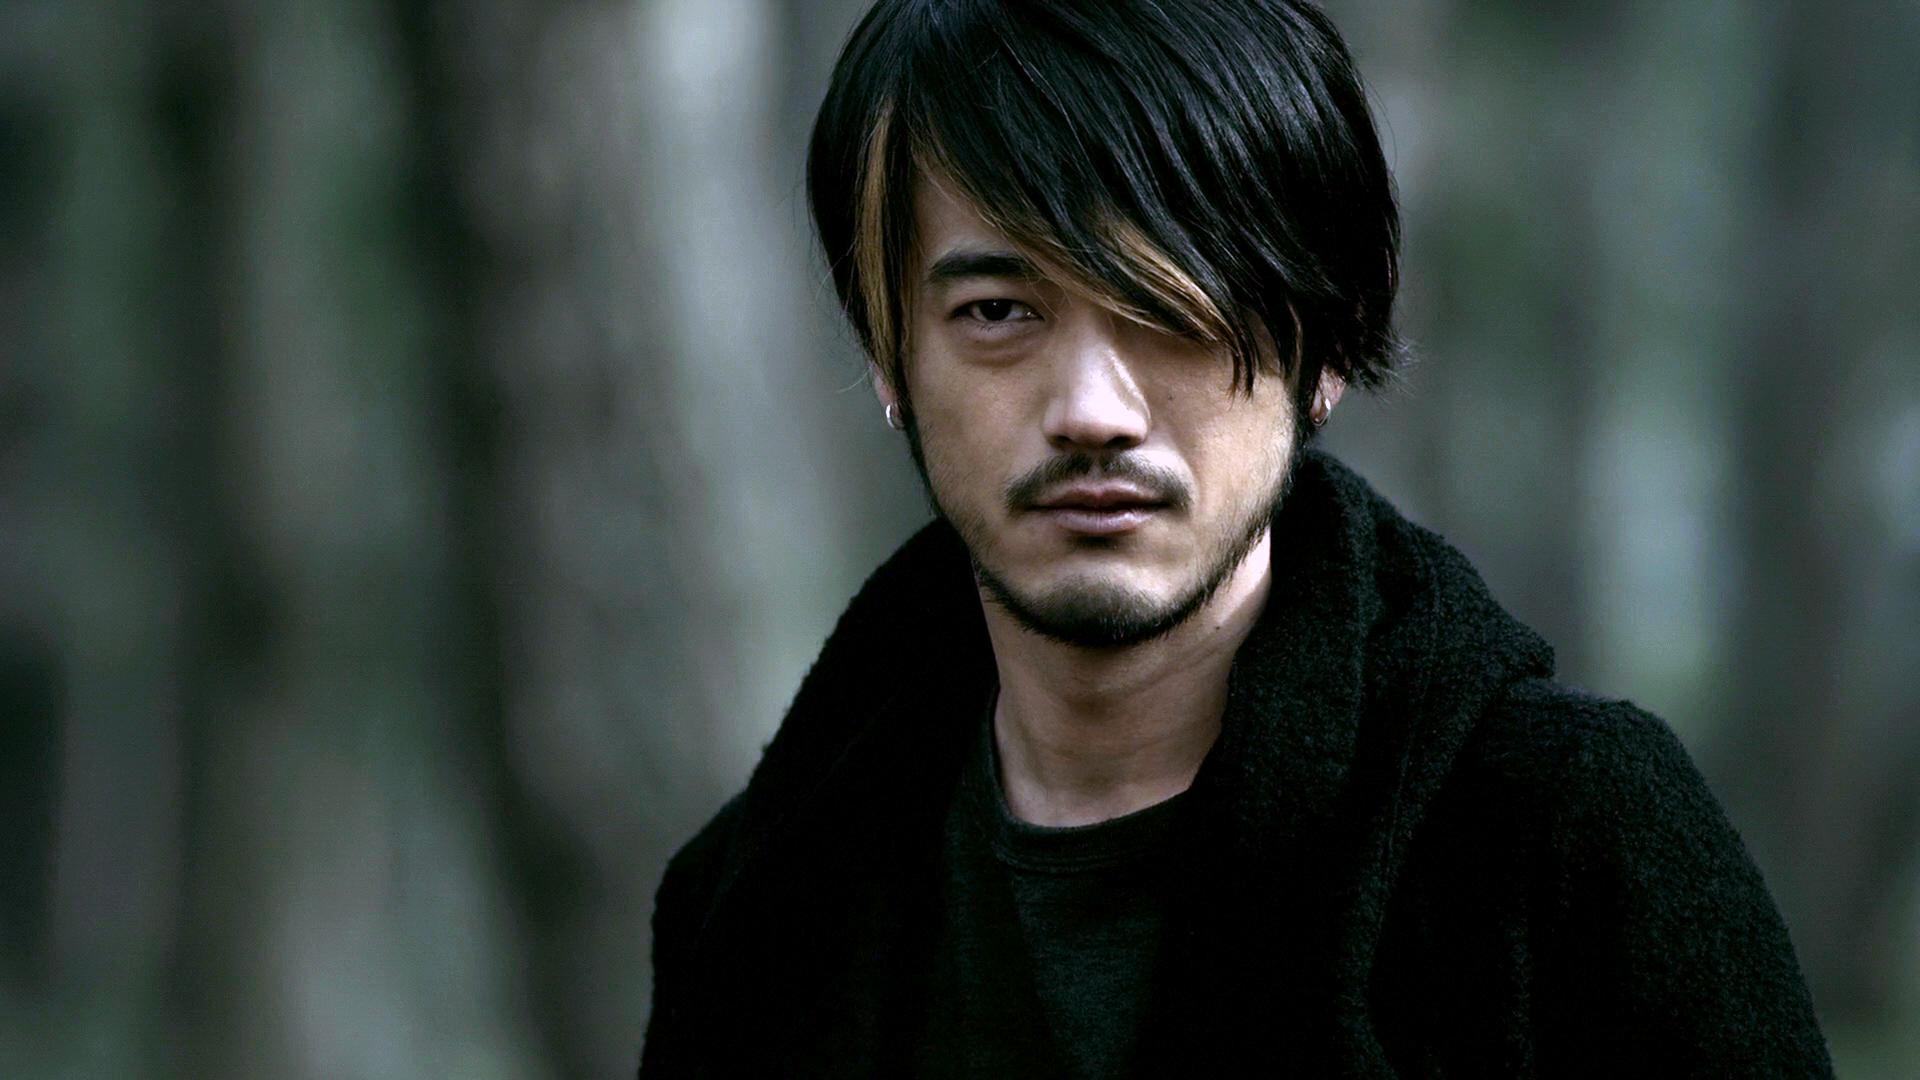 Jin Takayama/Appearances